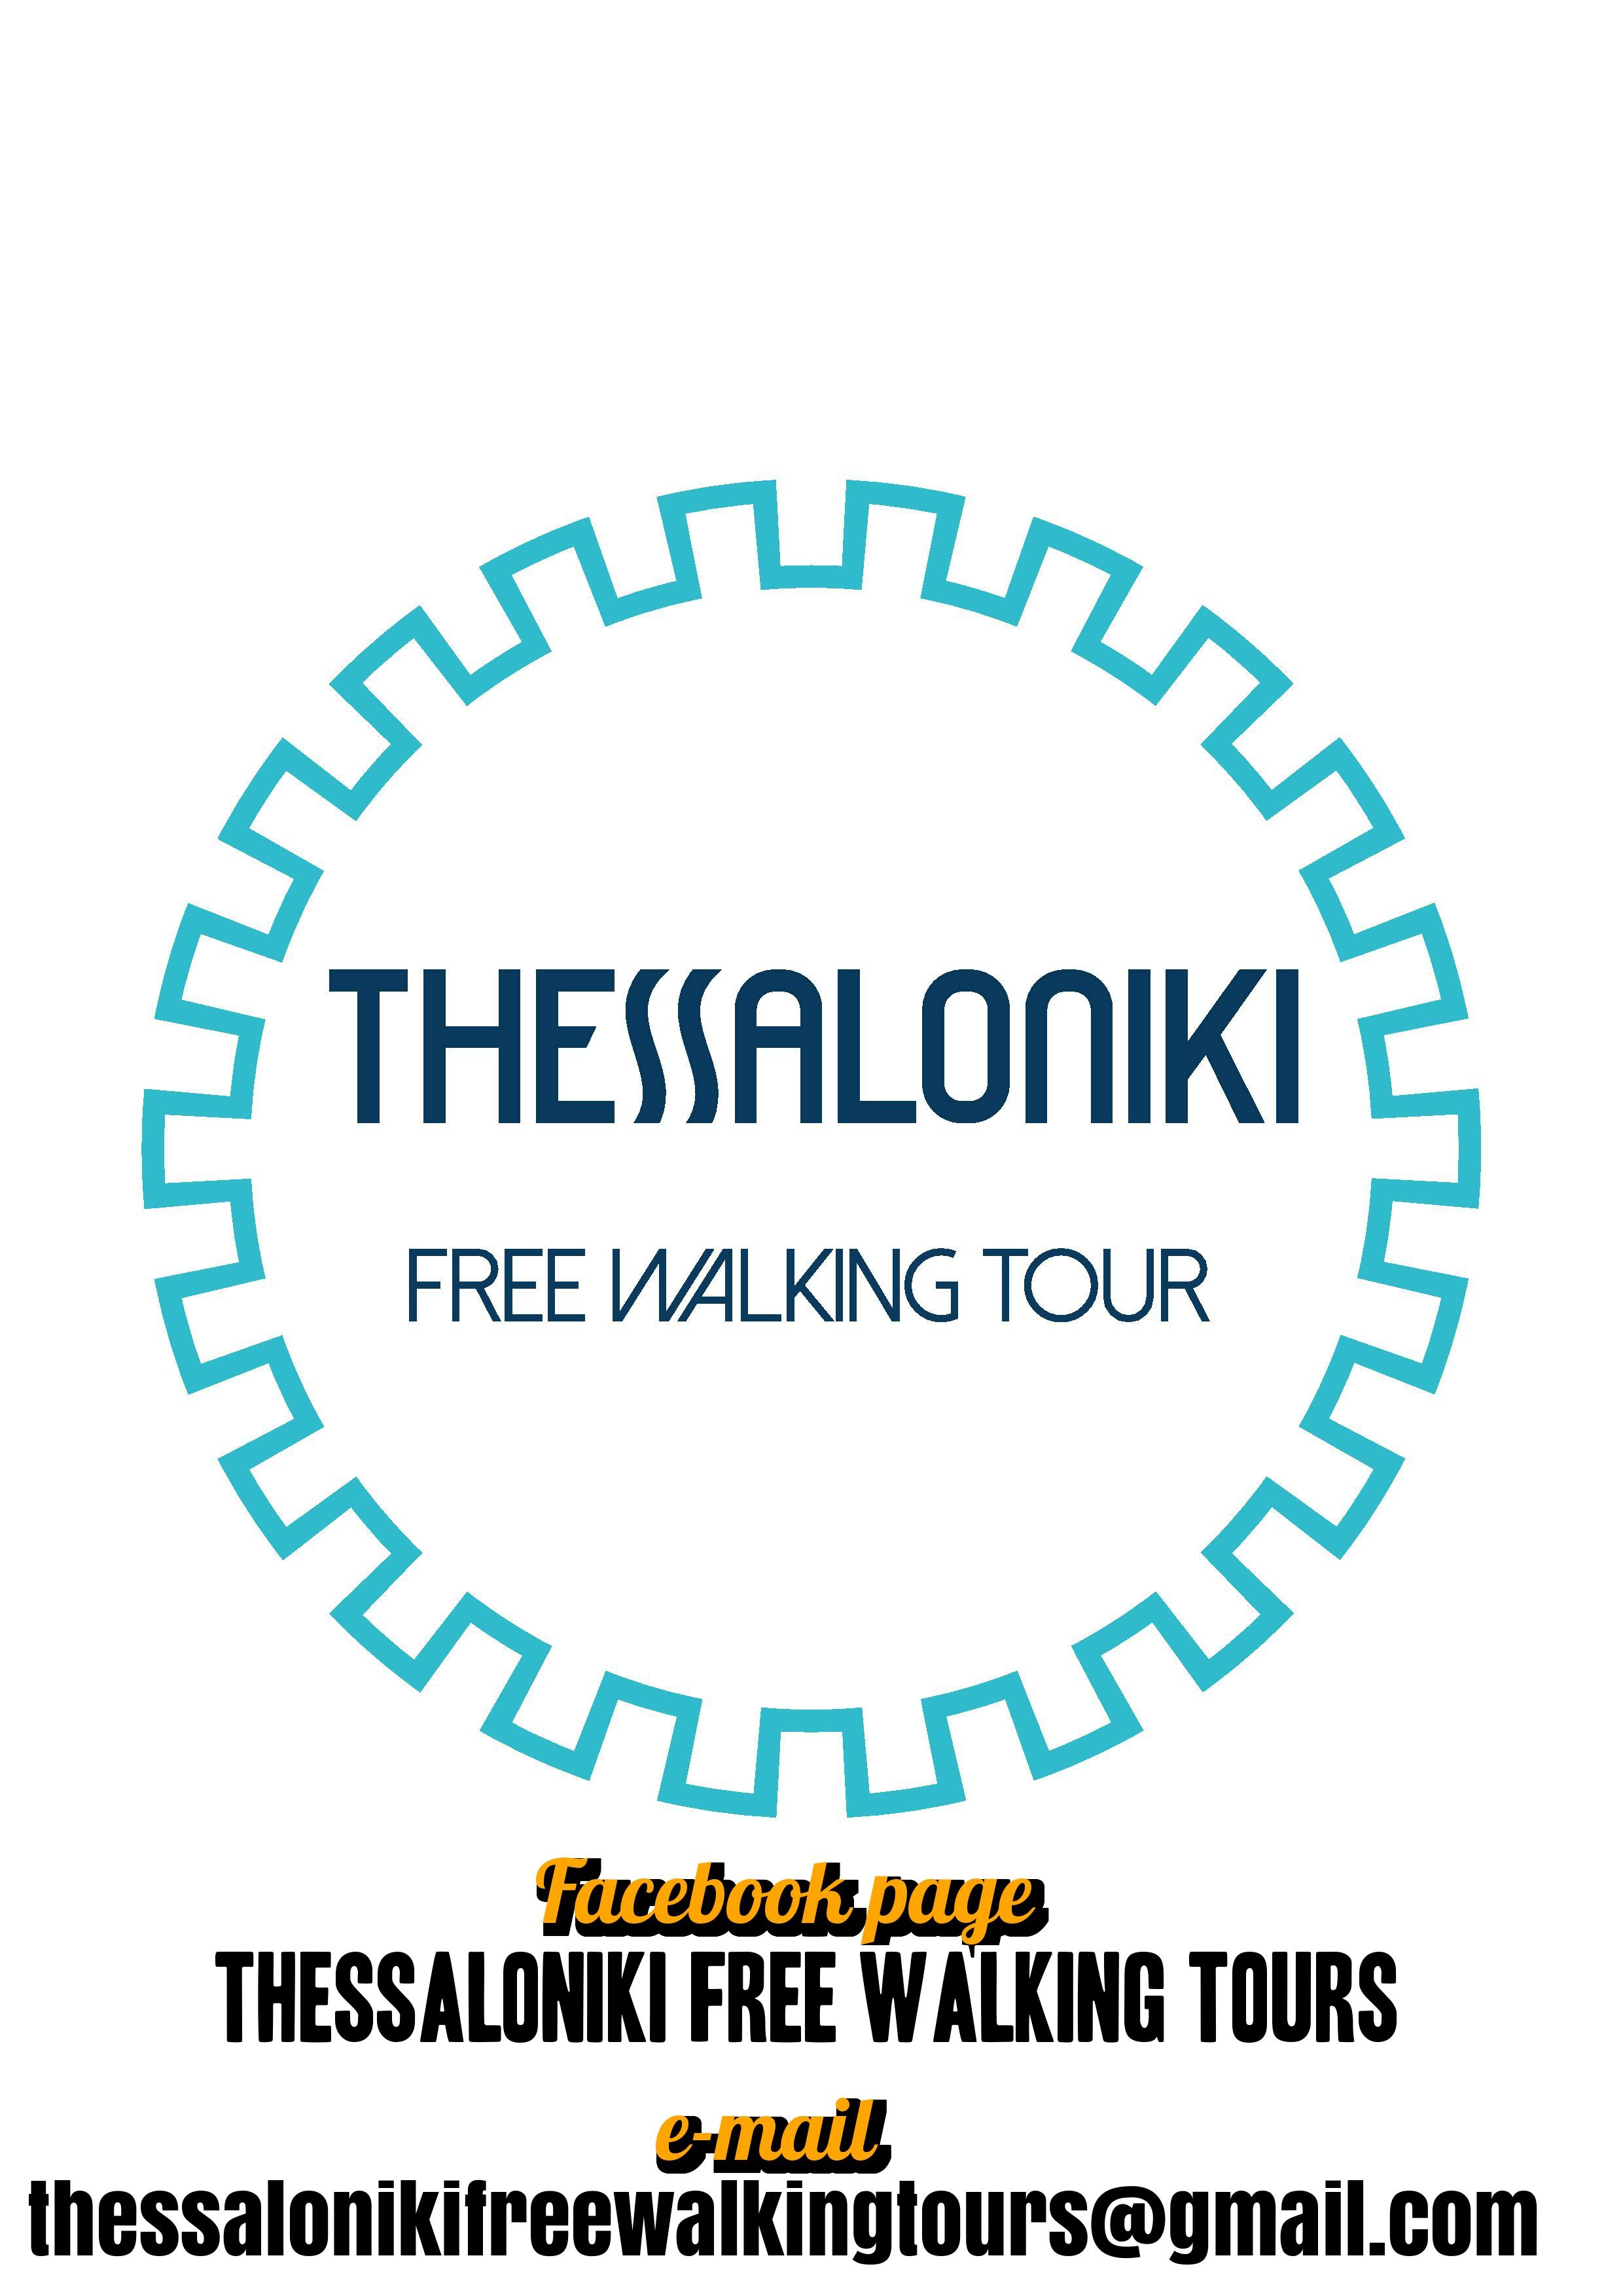 Thesaloniki Free Walking Tour